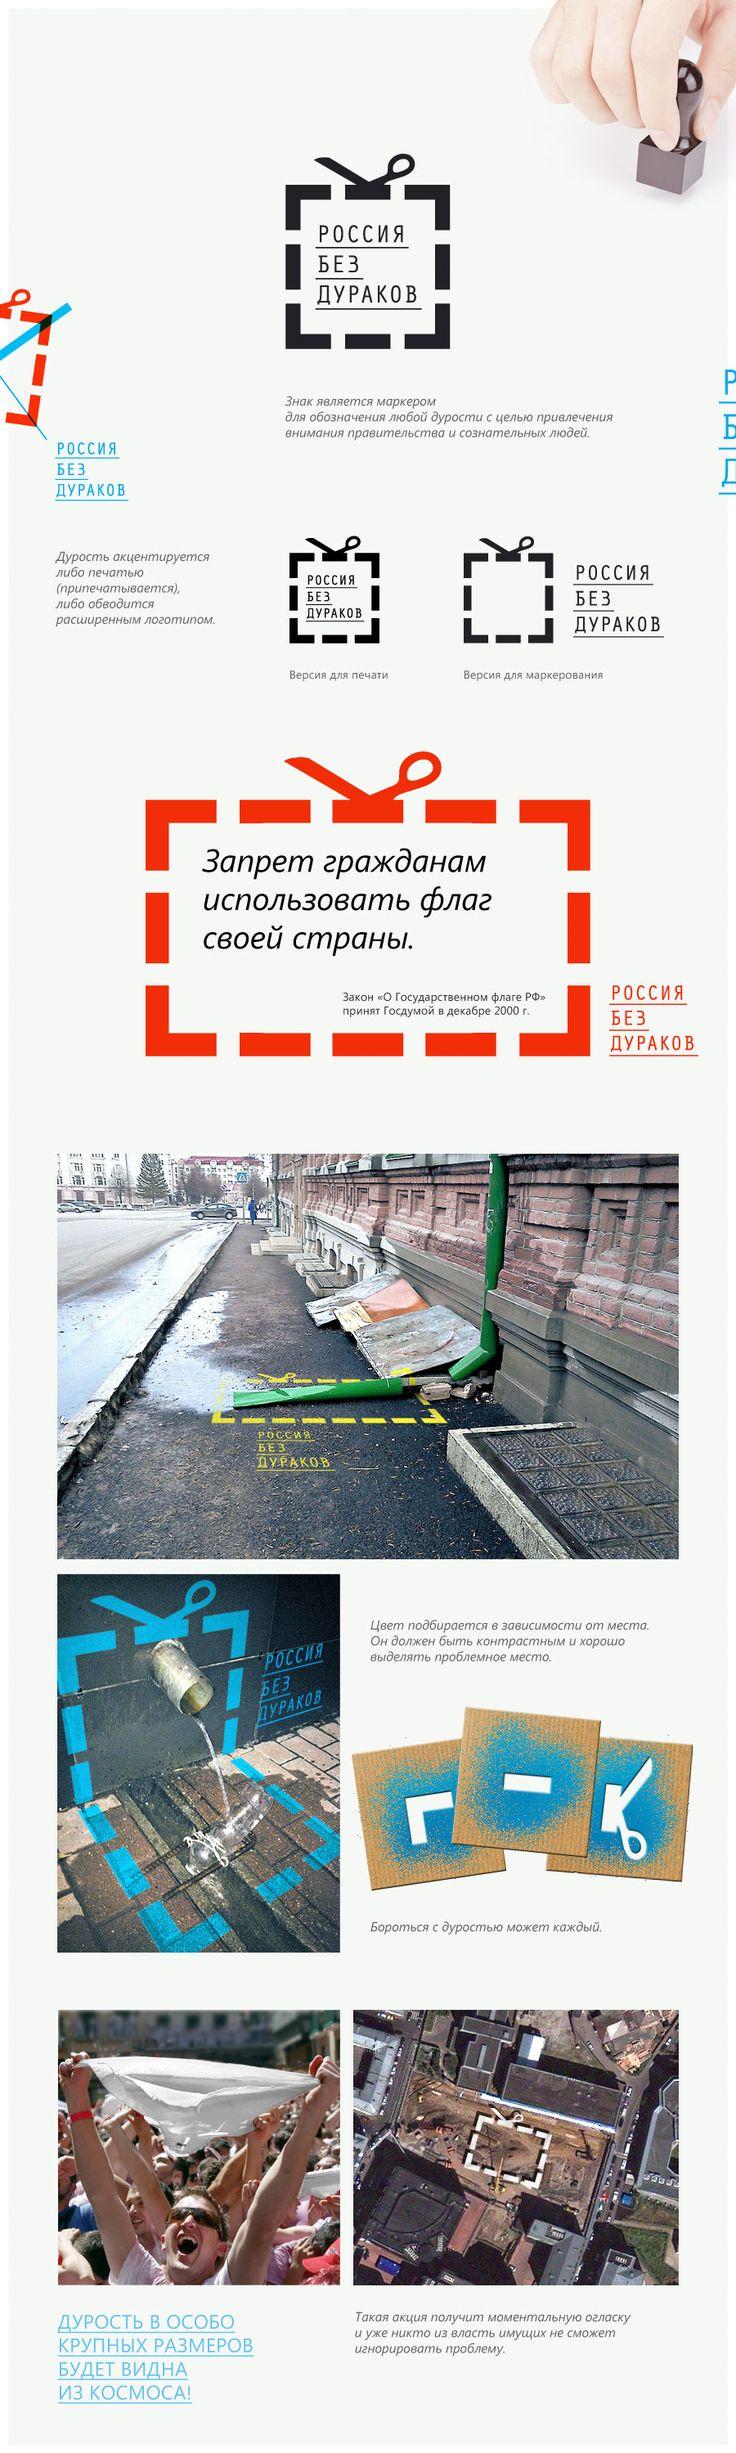 Россия без дураков, «Россиябездураков.рф» Competition © Сергей Ватунский